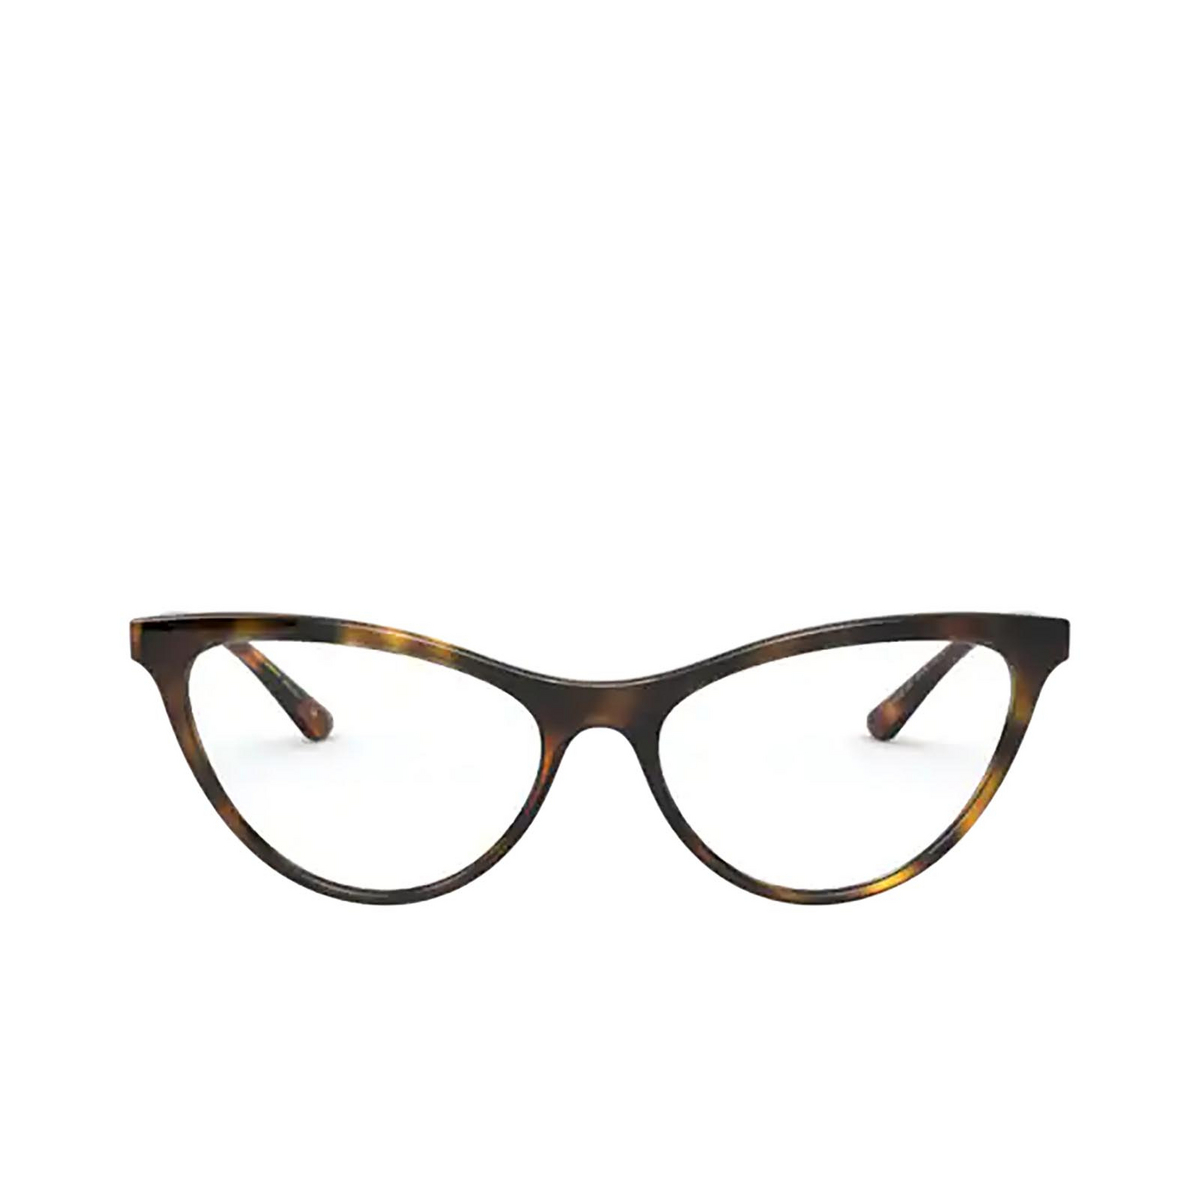 Dolce & Gabbana® Cat-eye Eyeglasses: DG5058 color Havana 502 - front view.